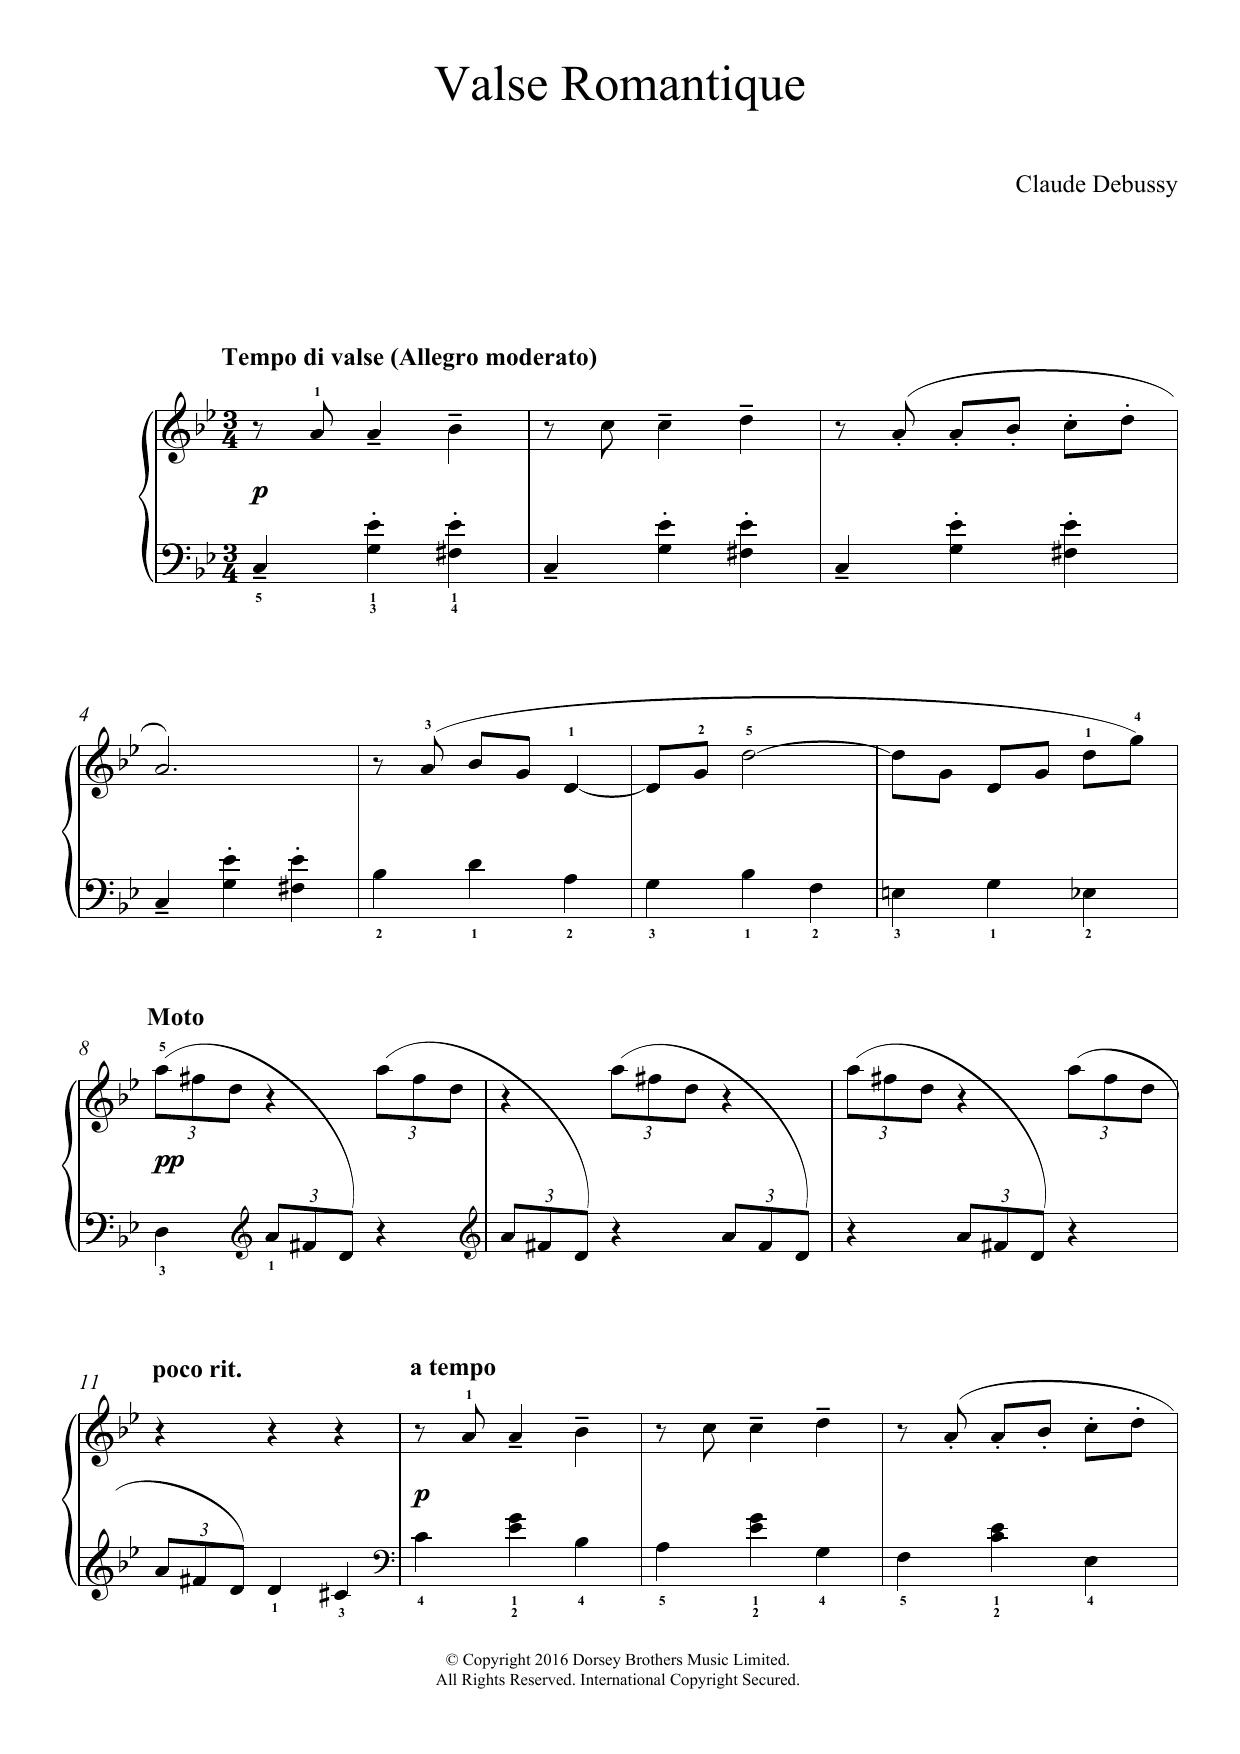 Valse Romantique Sheet Music